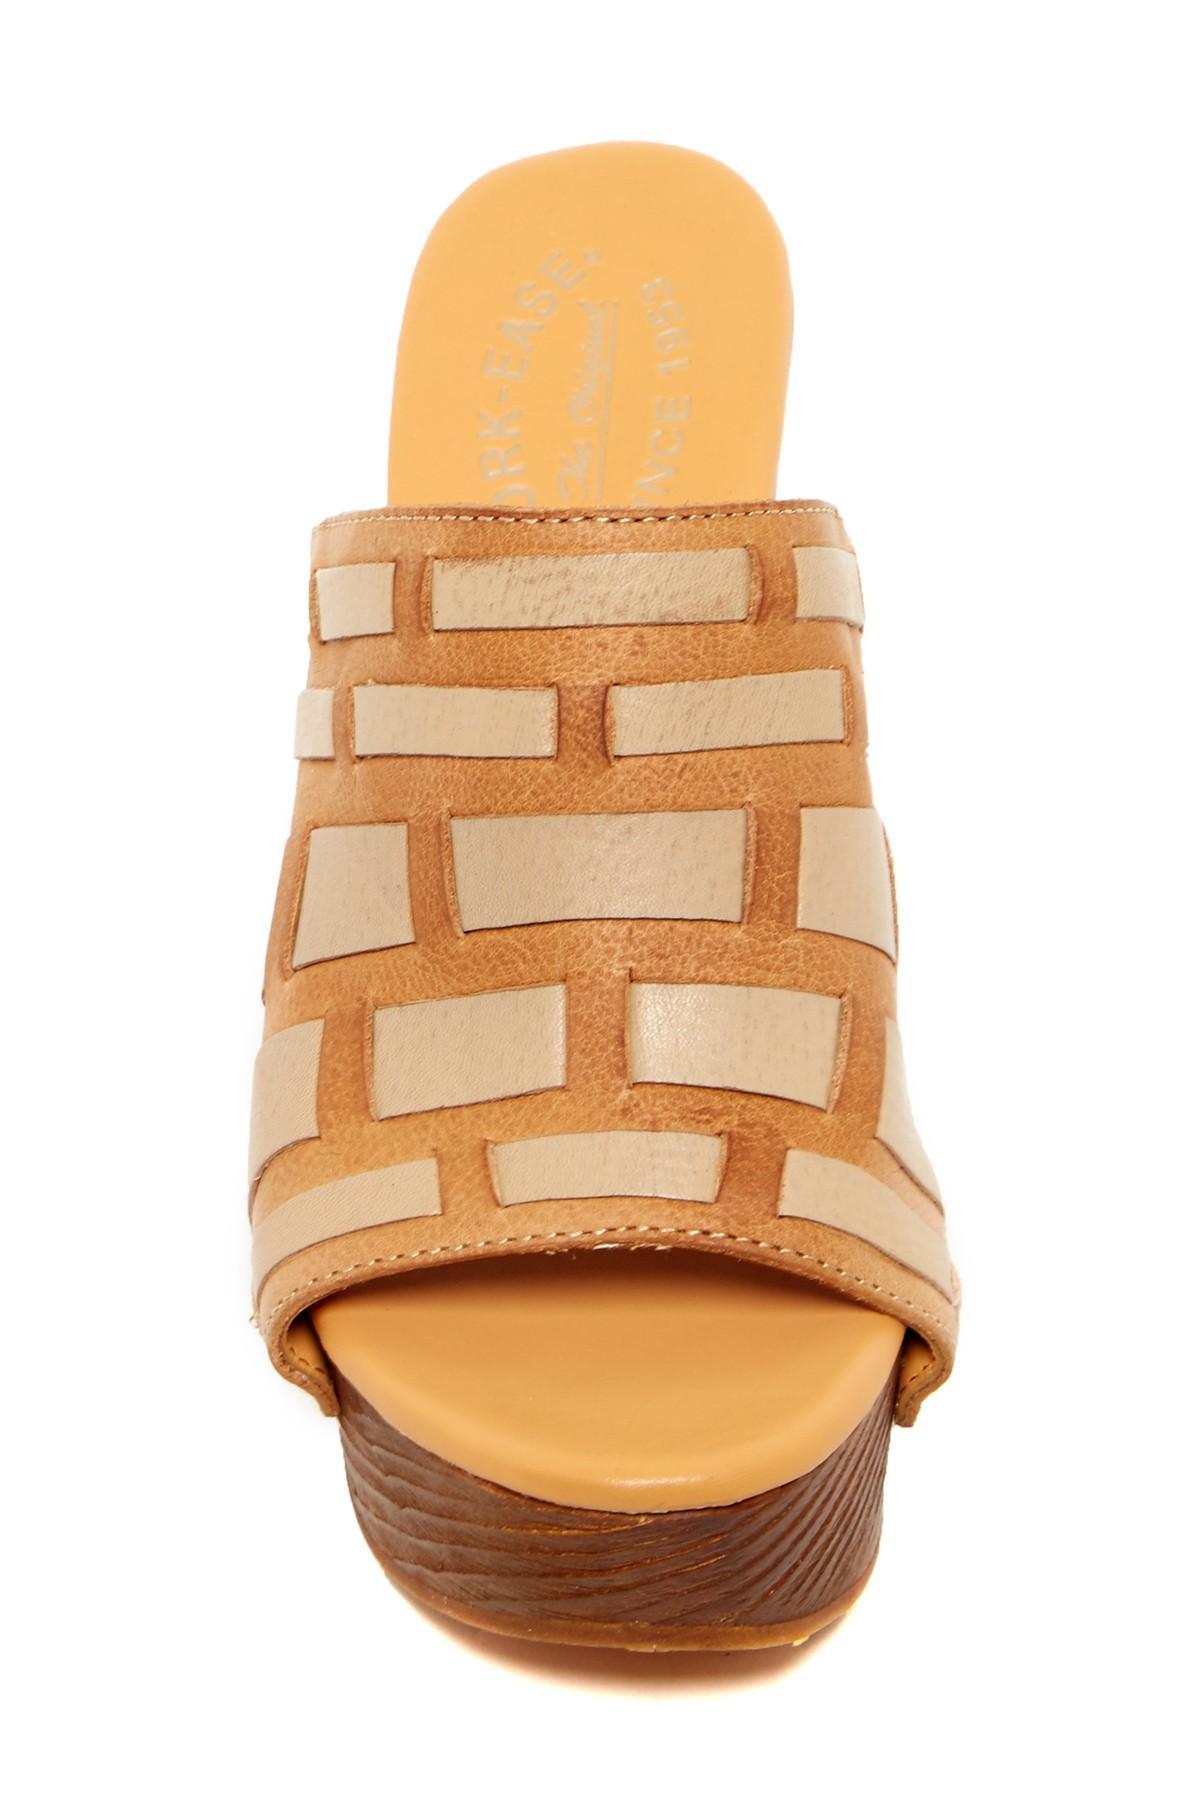 Stacked Shoe Rack: Kork-Ease Charissa Platform Sandal In Brown